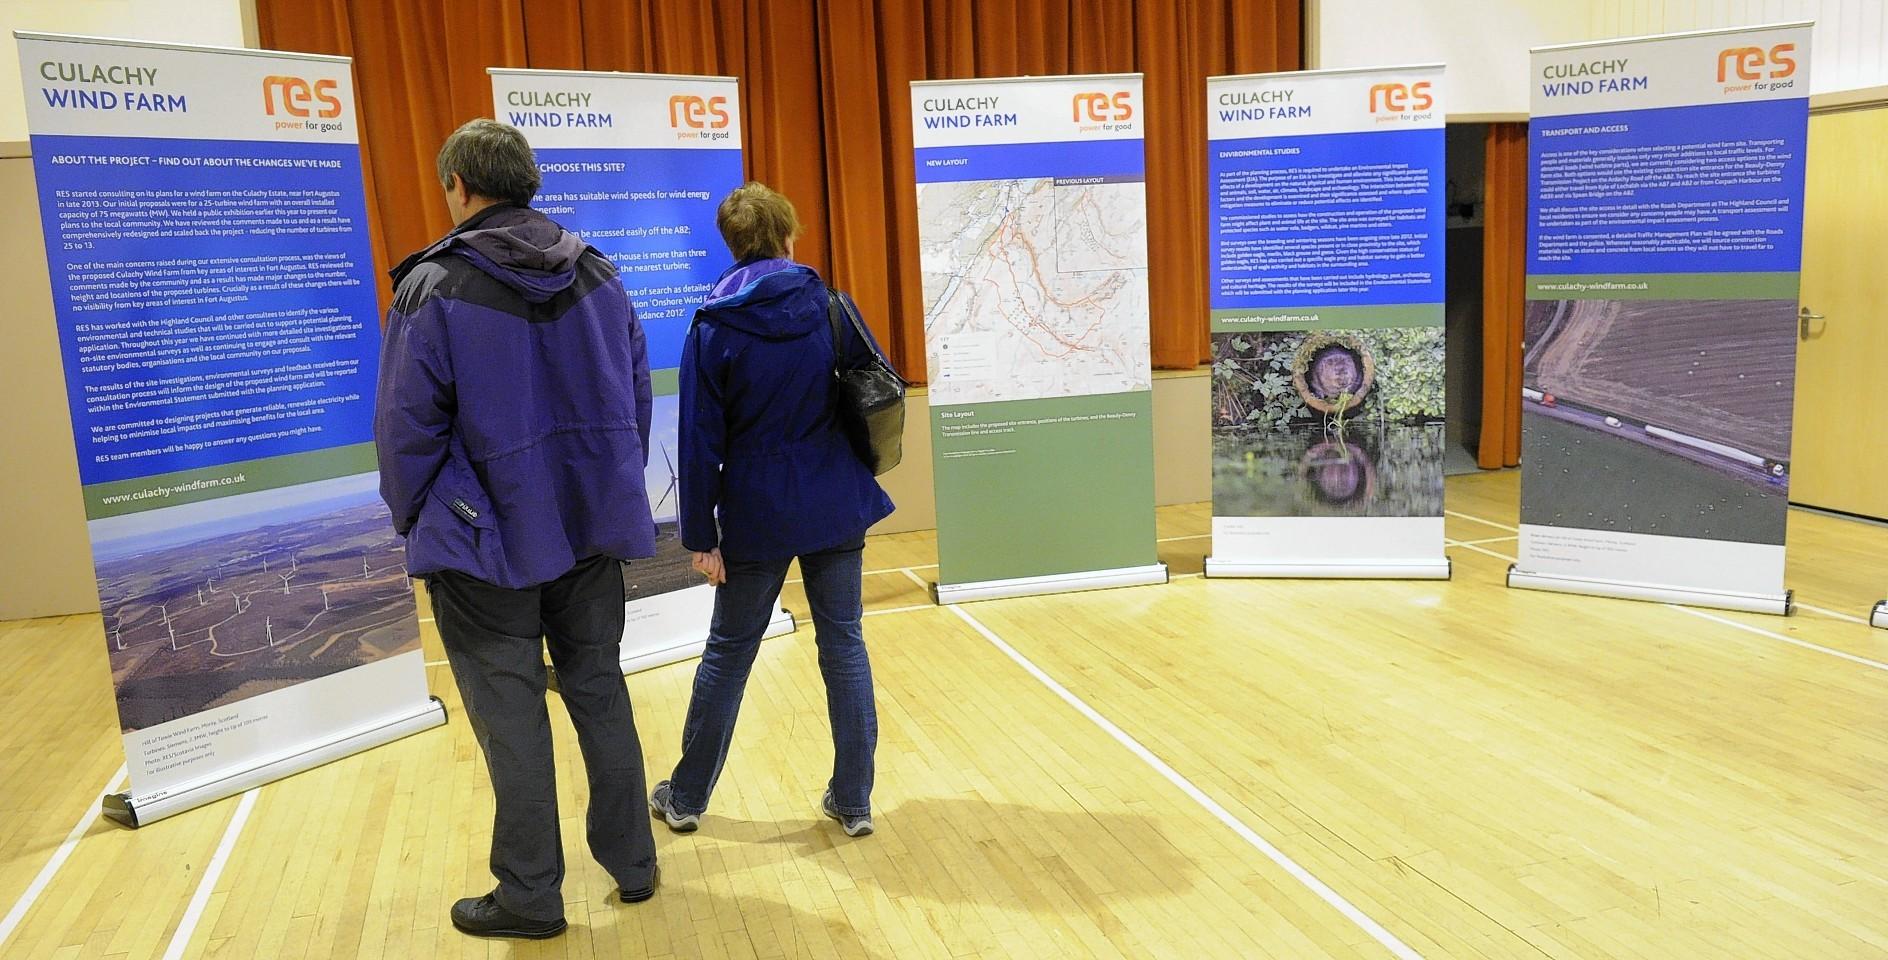 Public exhibitions of the plans